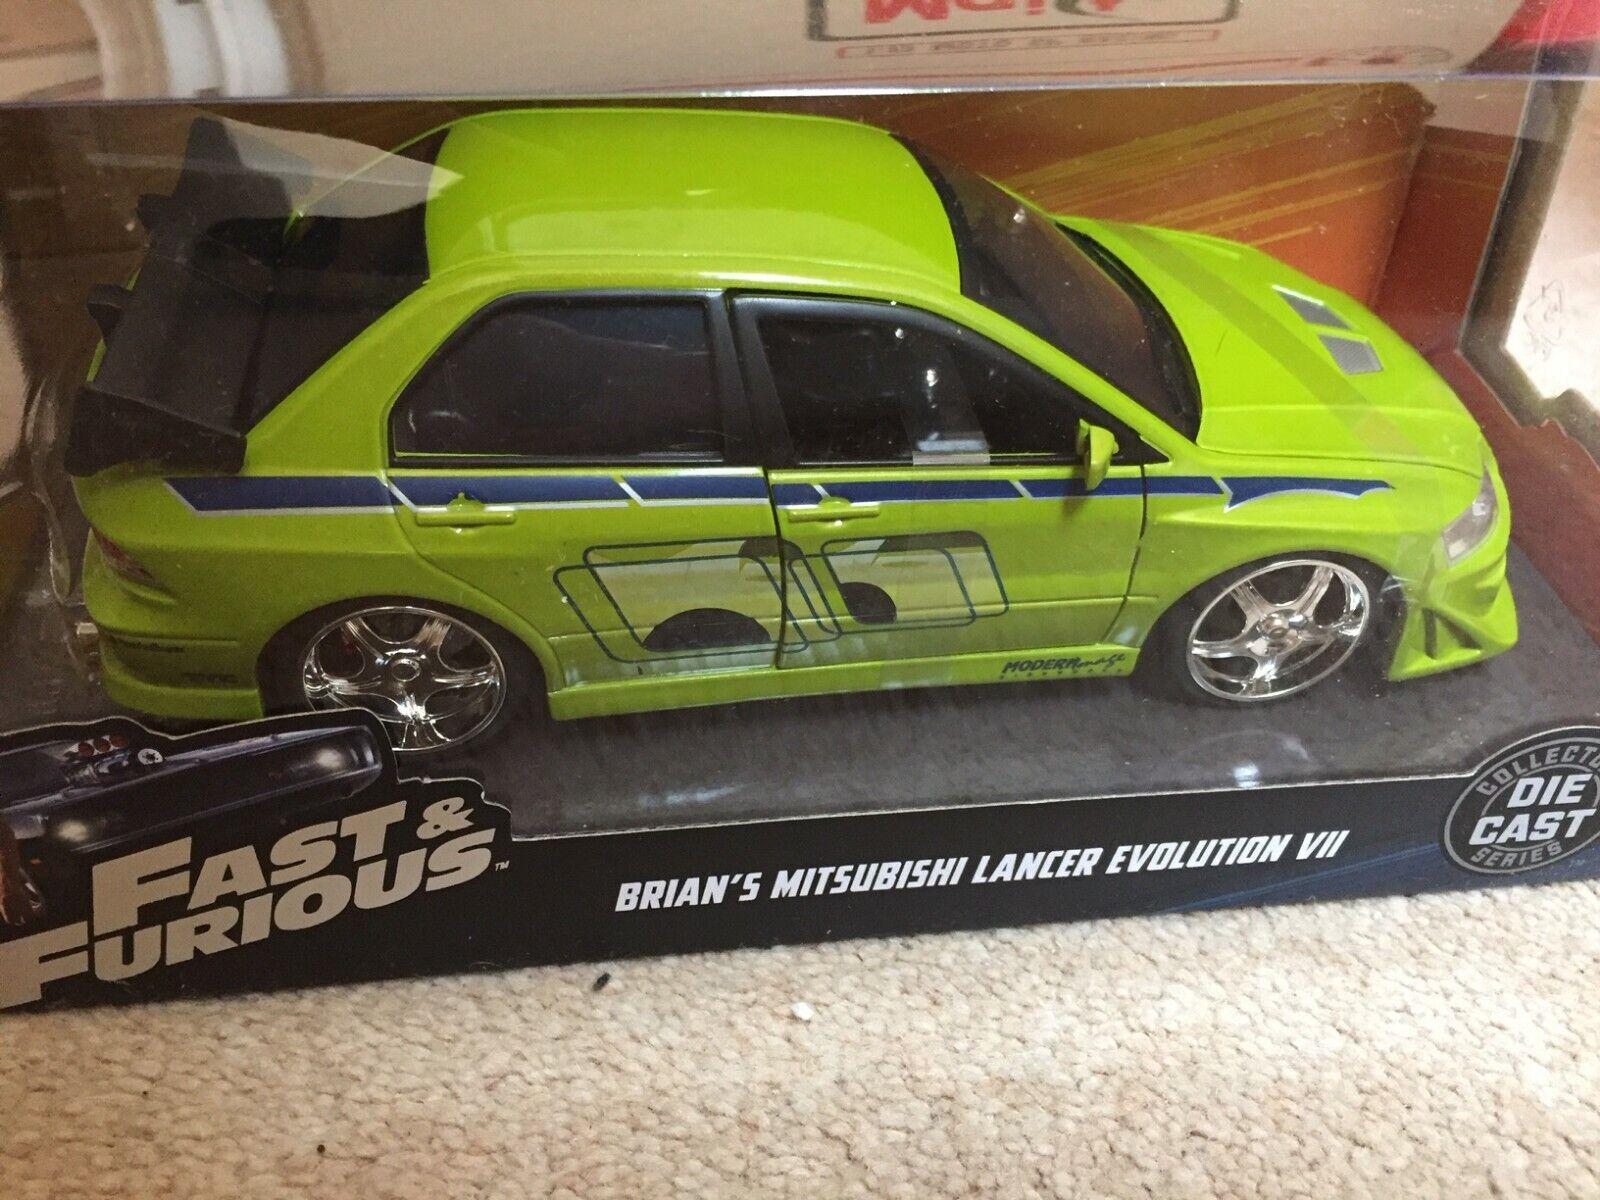 NEW Jada Toys JADA99788 Brians Mitsubishi Lancer Evolution VII Fast /& Furious 1:24